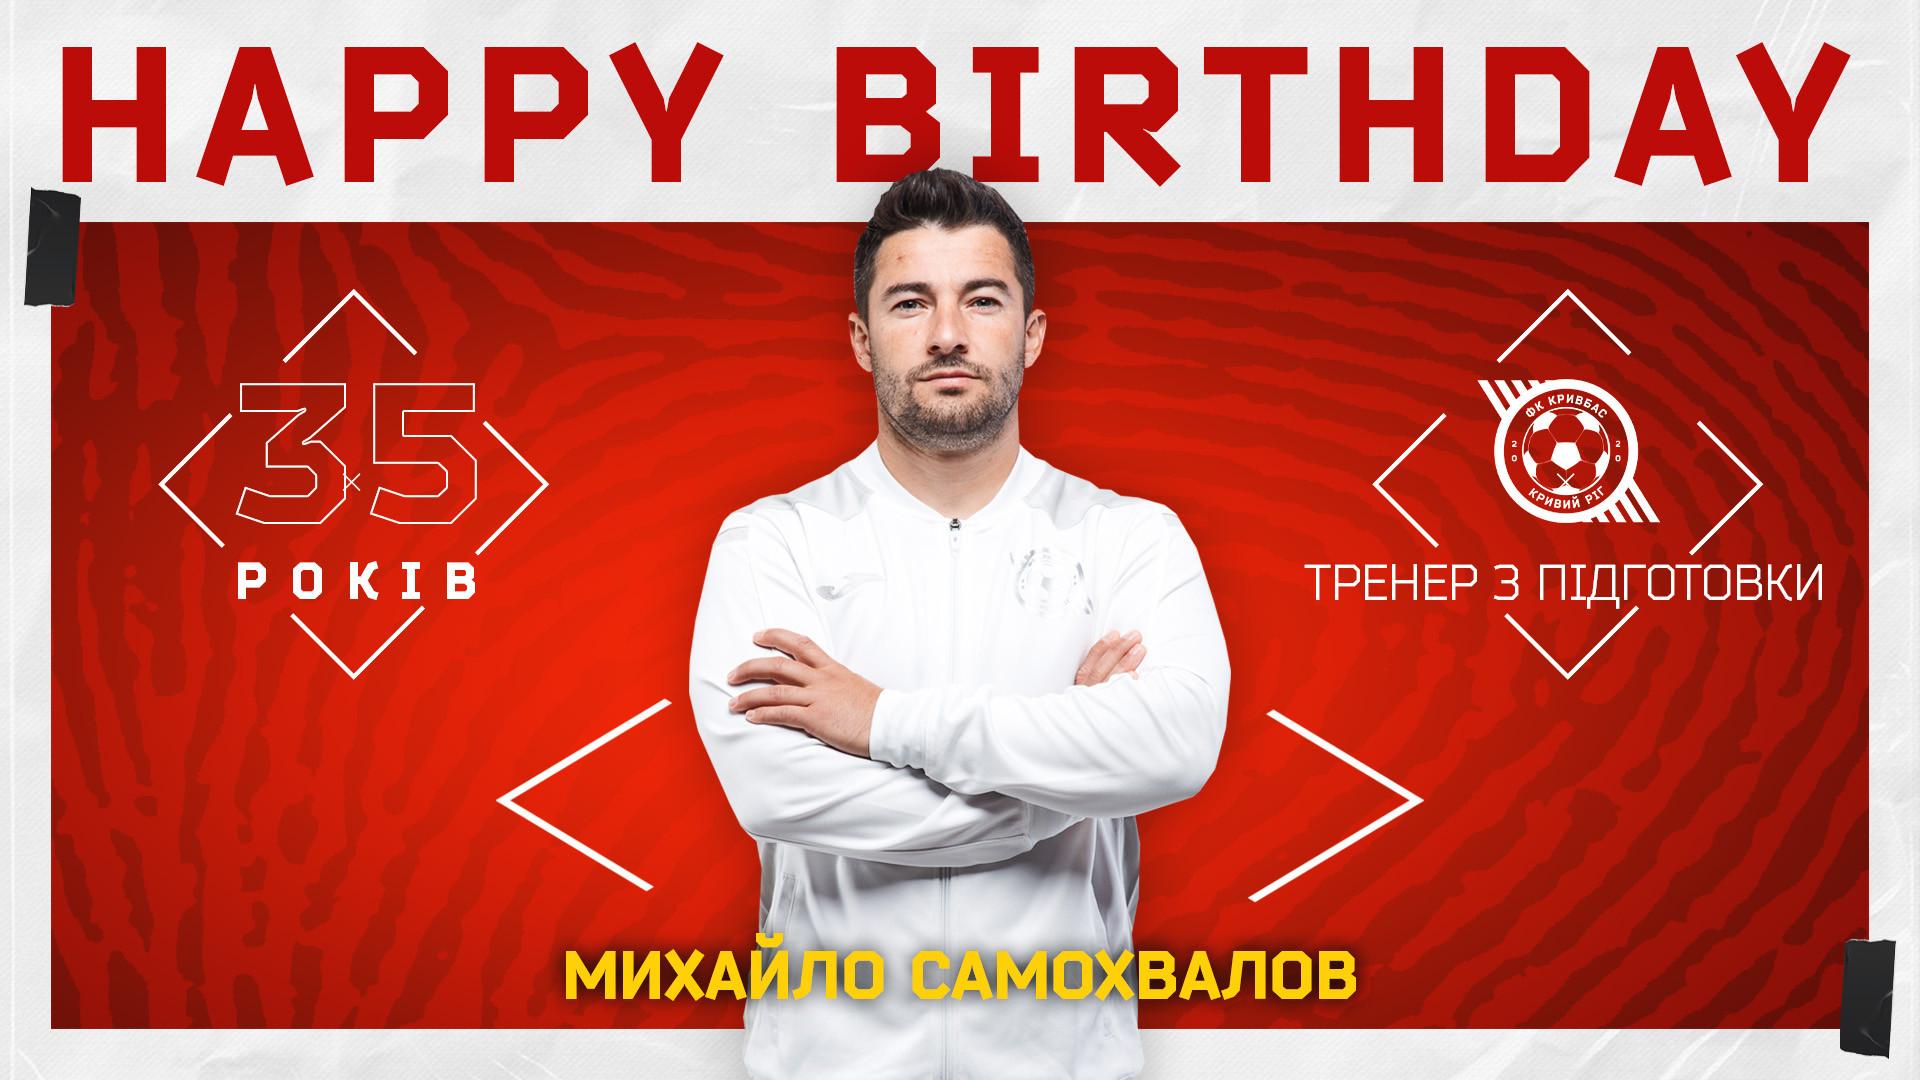 Михайлу Самохвалову - 35!}